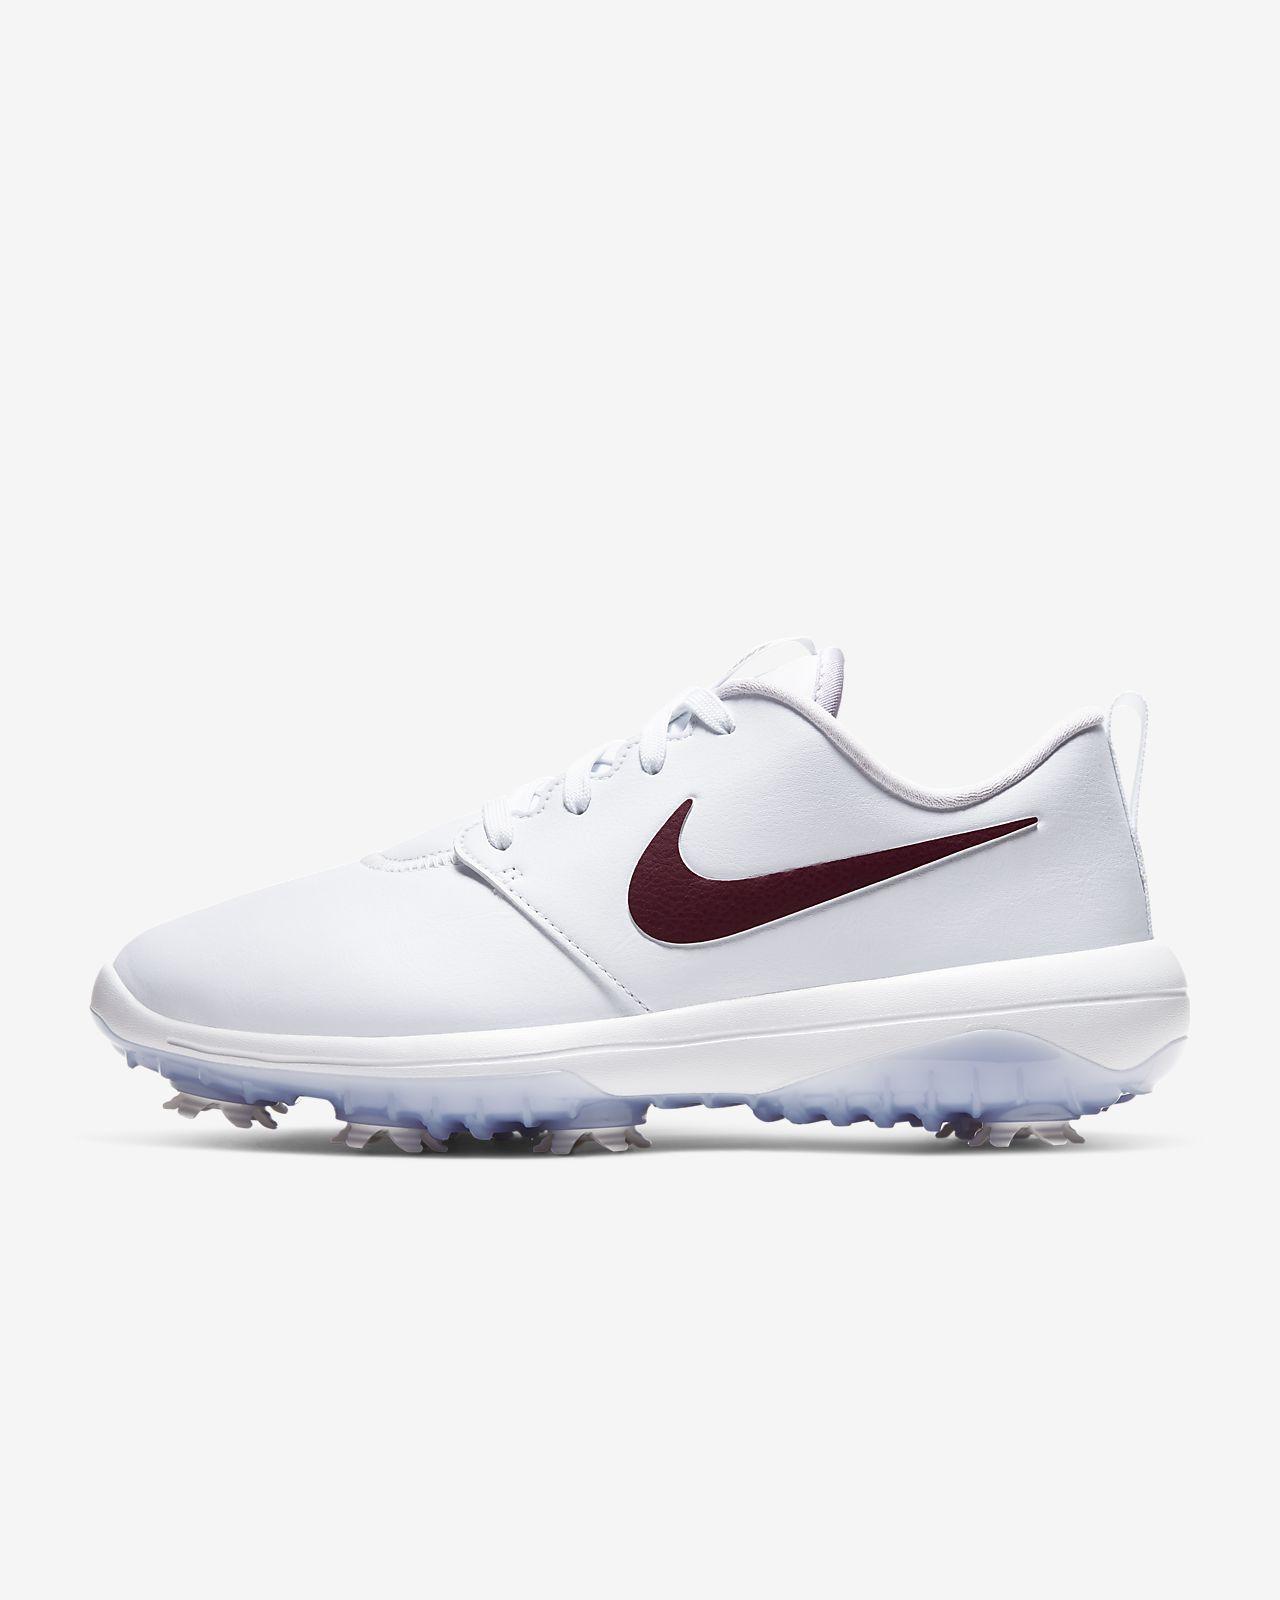 Nike Roshe G Tour Zapatillas de golf Mujer